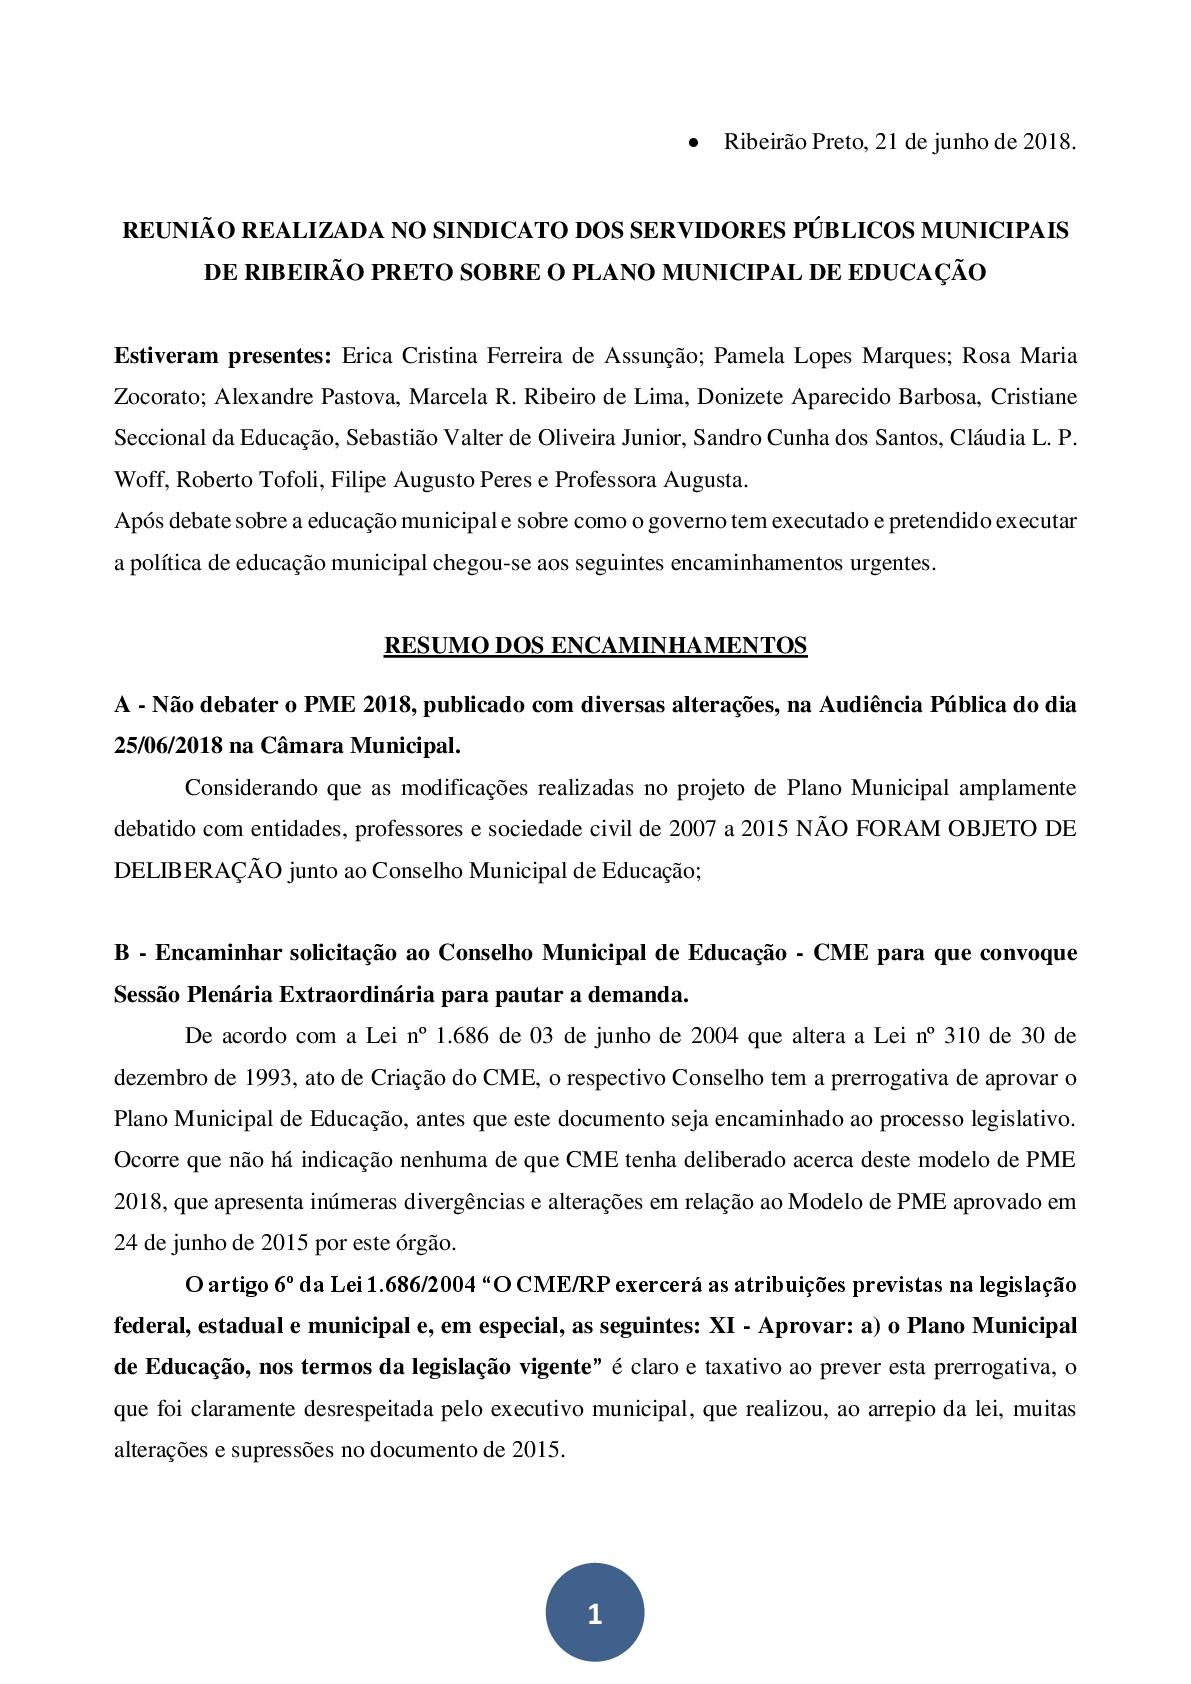 TEXTO_REUNIAO_SINDICATO_ENTIDADES_21_06_2018-001